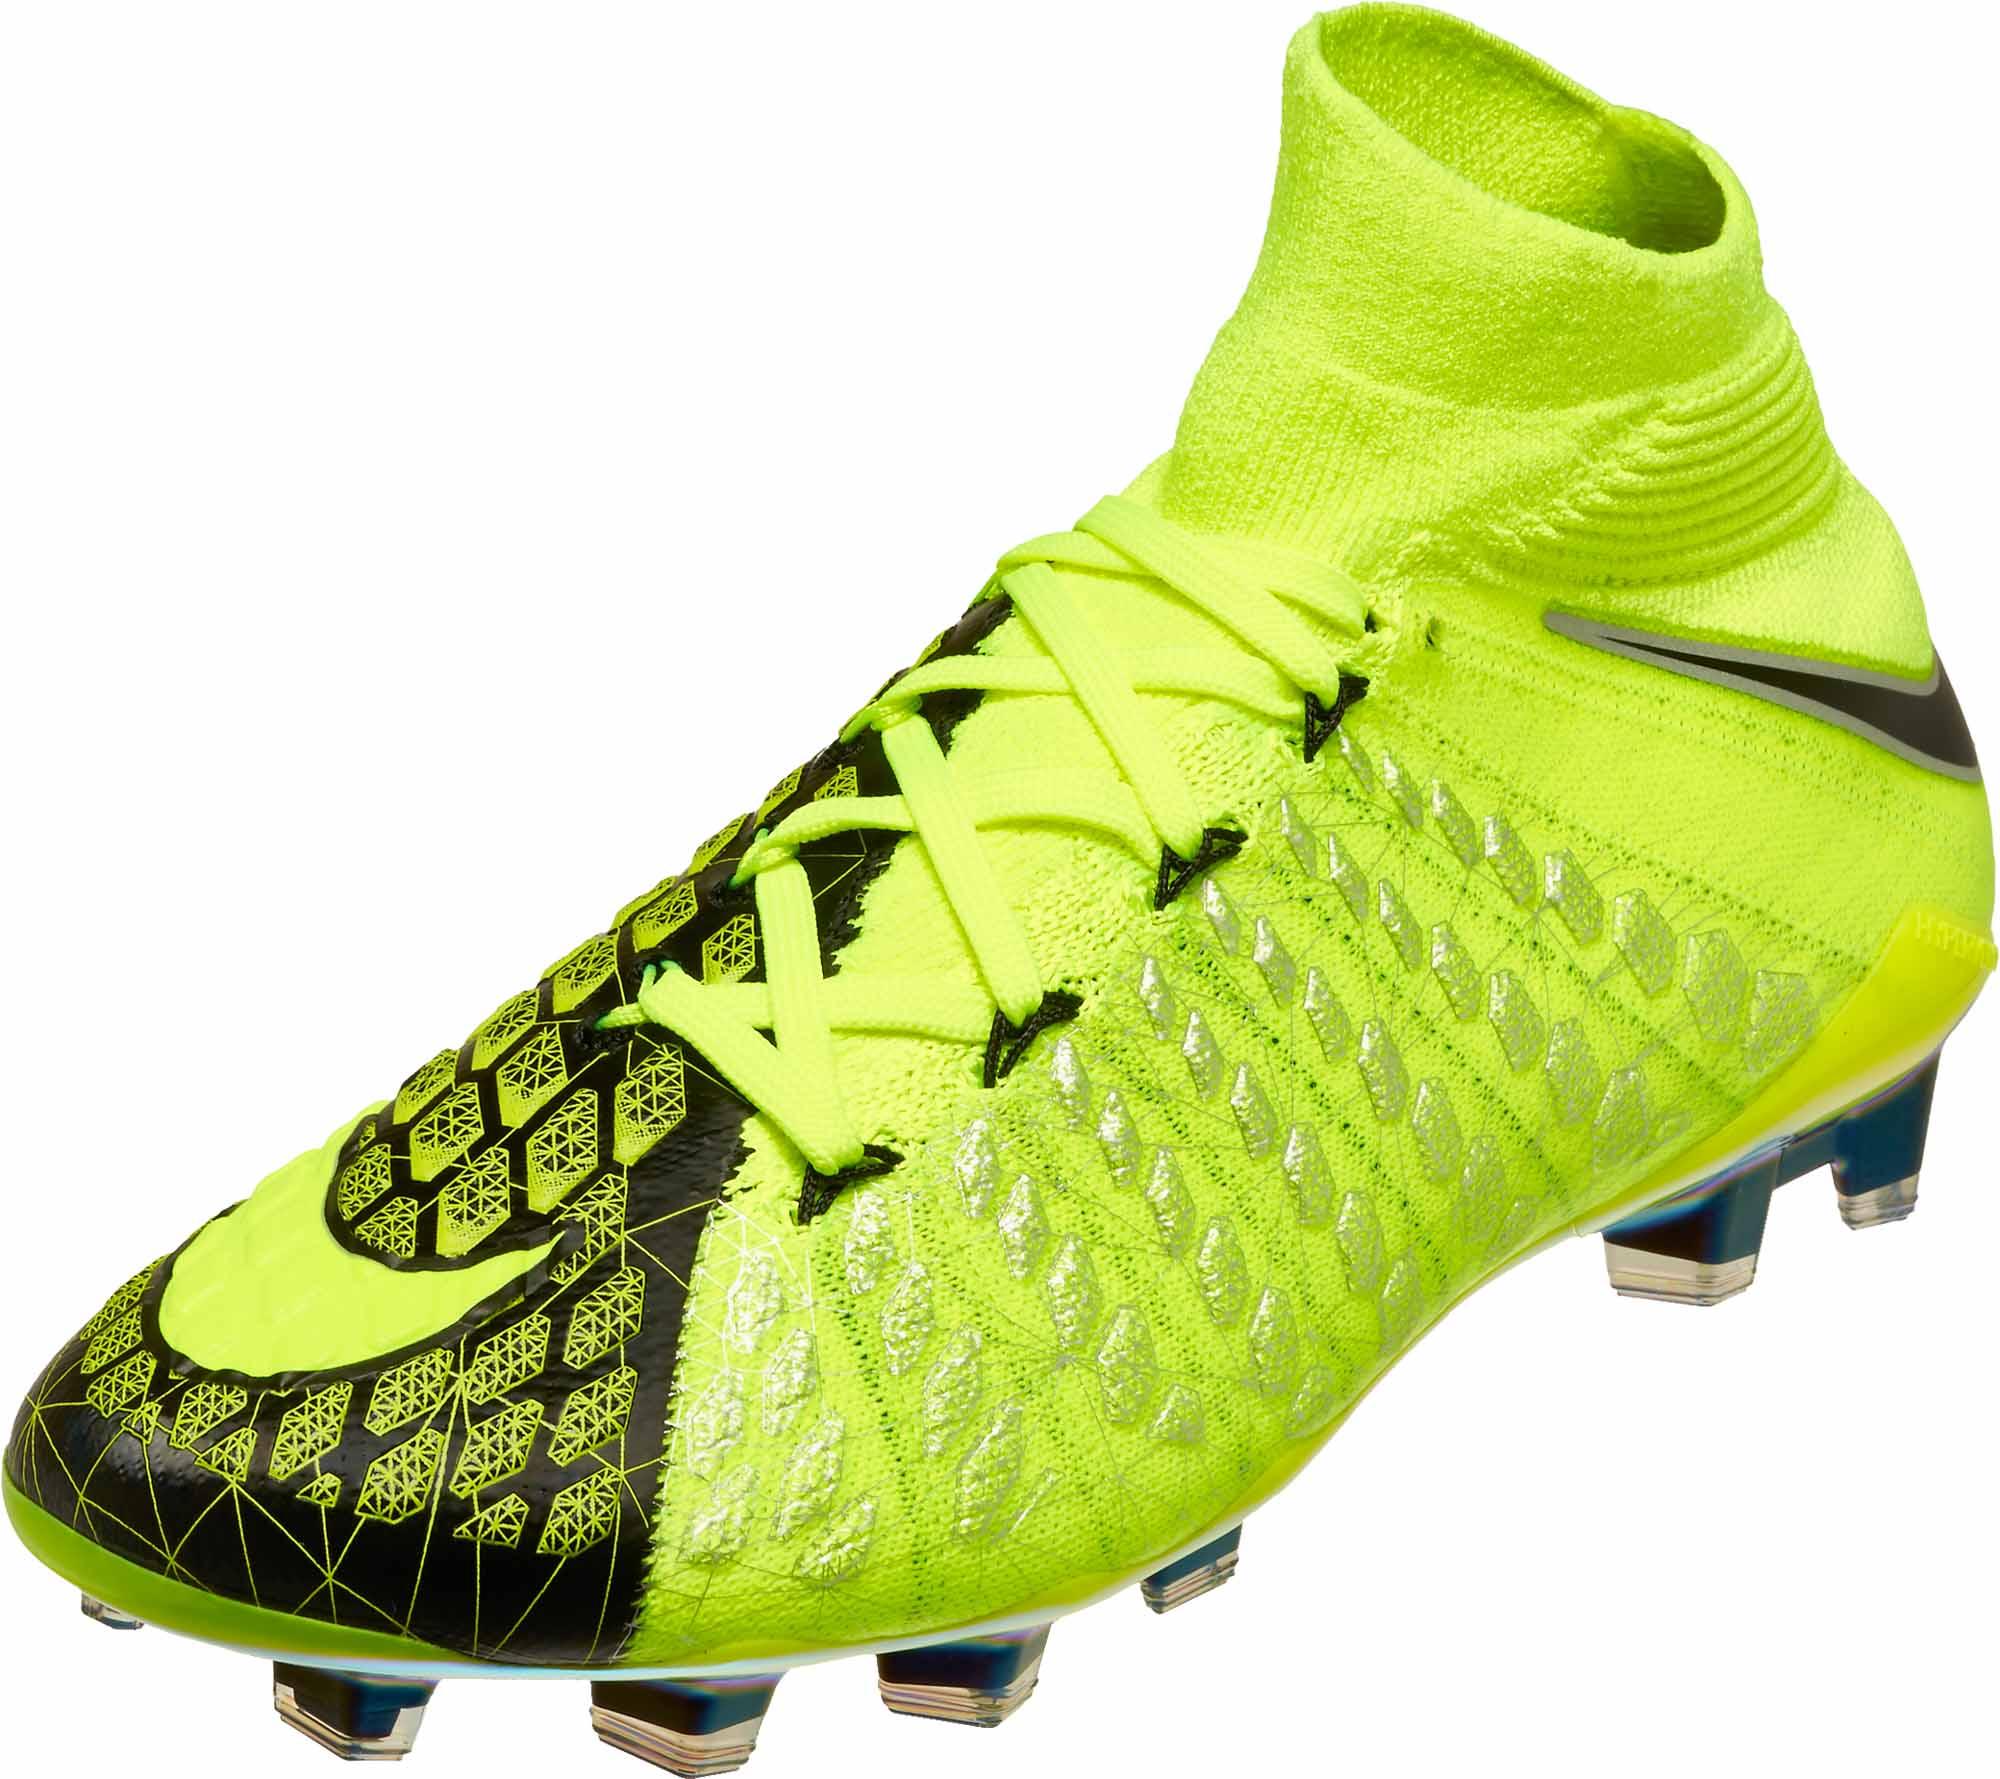 uk availability 2cdad 0c1f0 Nike Hypervenom Phantom III DF FG - EA Sports - Volt